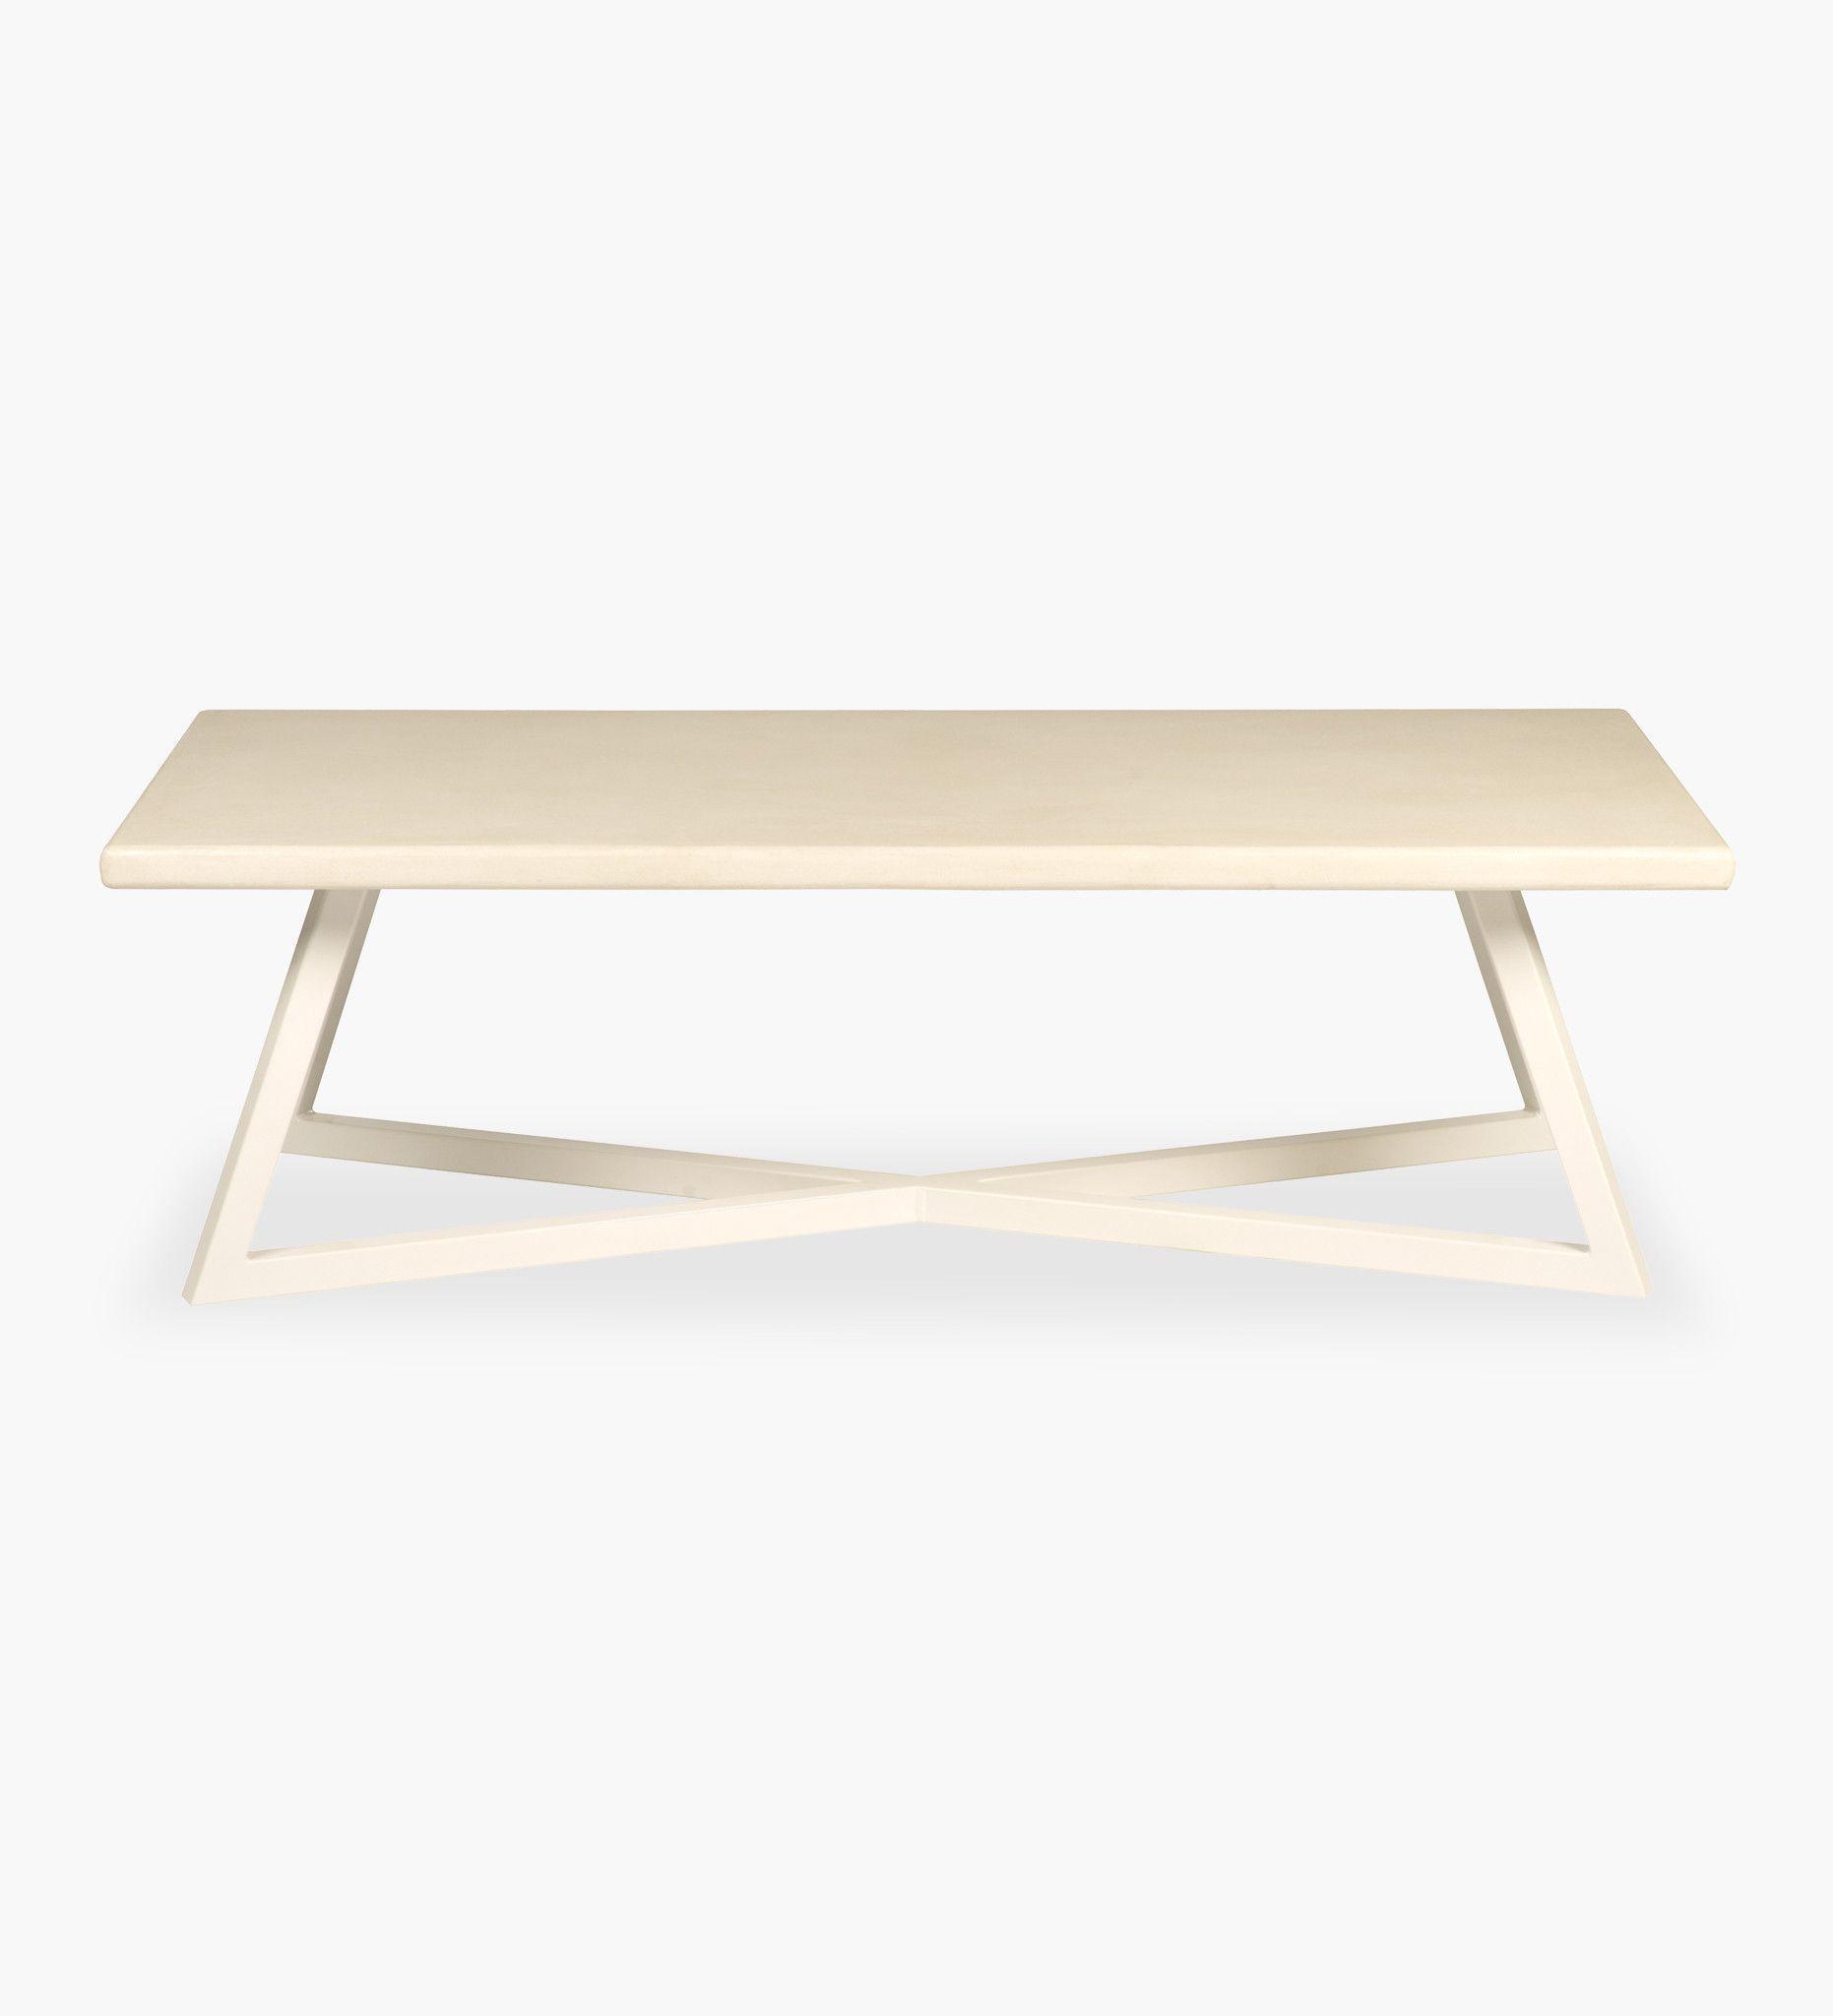 Pyramid Coffee Table Concrete Rectangular L